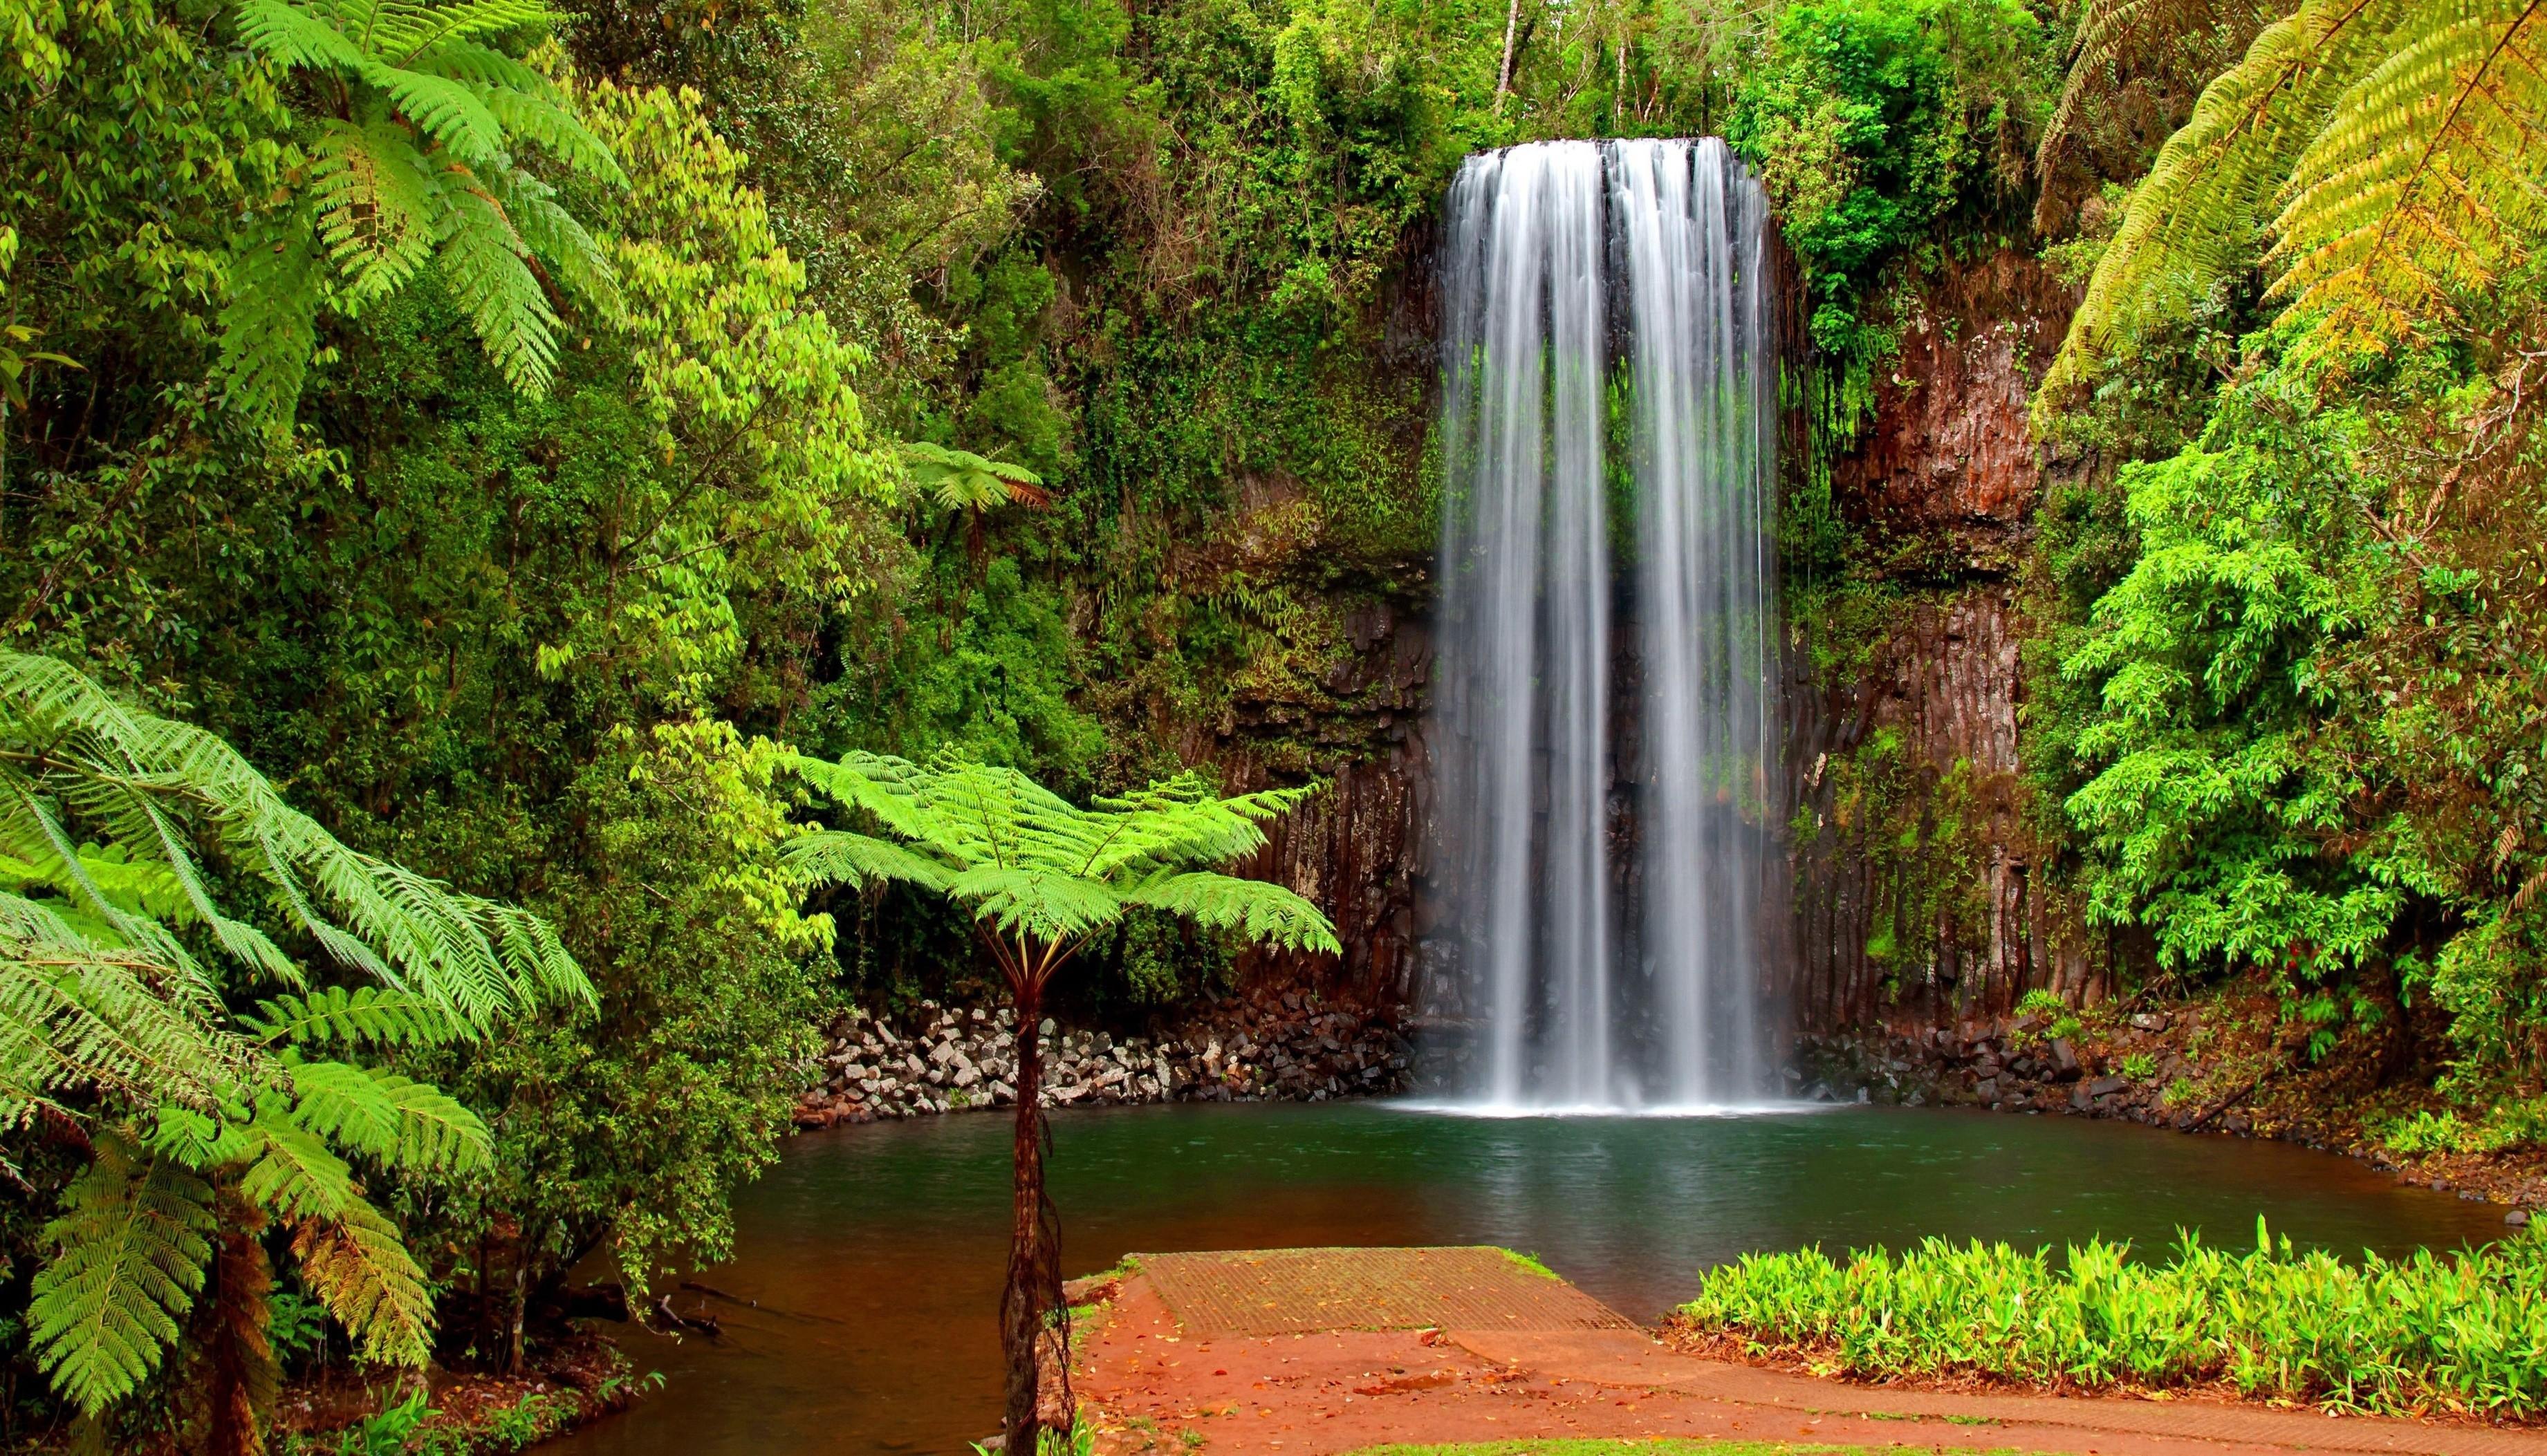 Fondos de pantalla paisaje cascada verde selva rbol for Cascada agua jardin